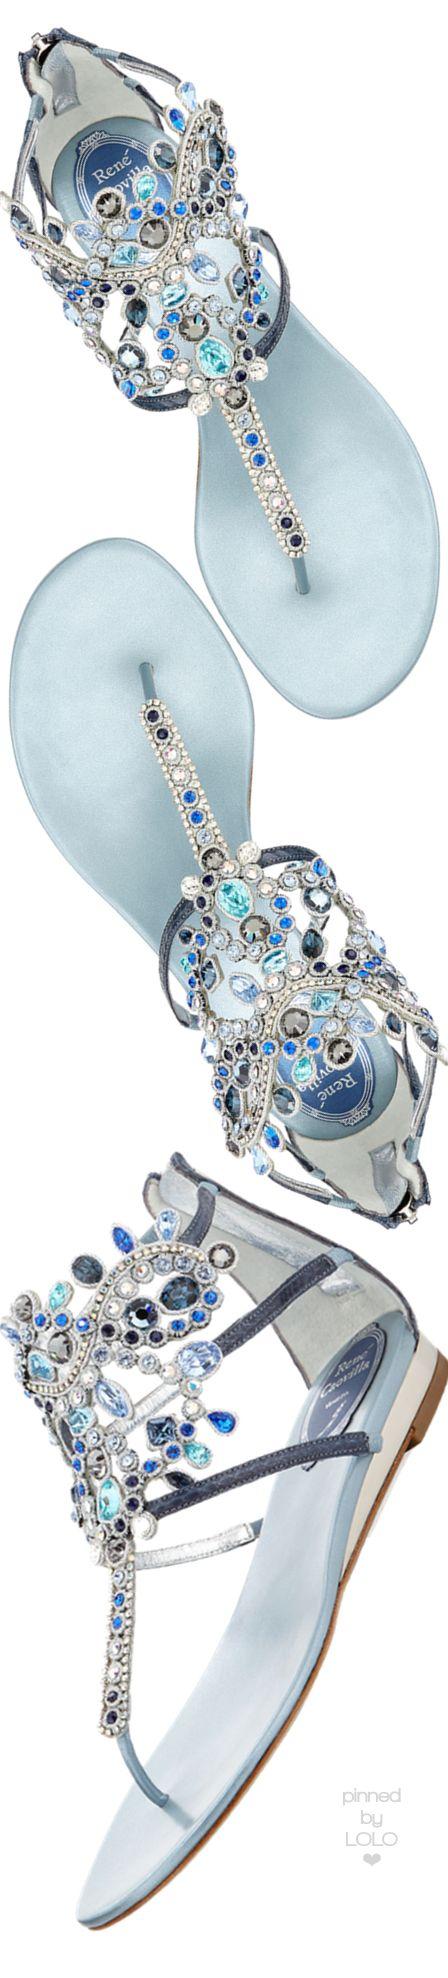 Rene Caovilla Crystal-Chandelier Thong Sandal | LOLO❤︎